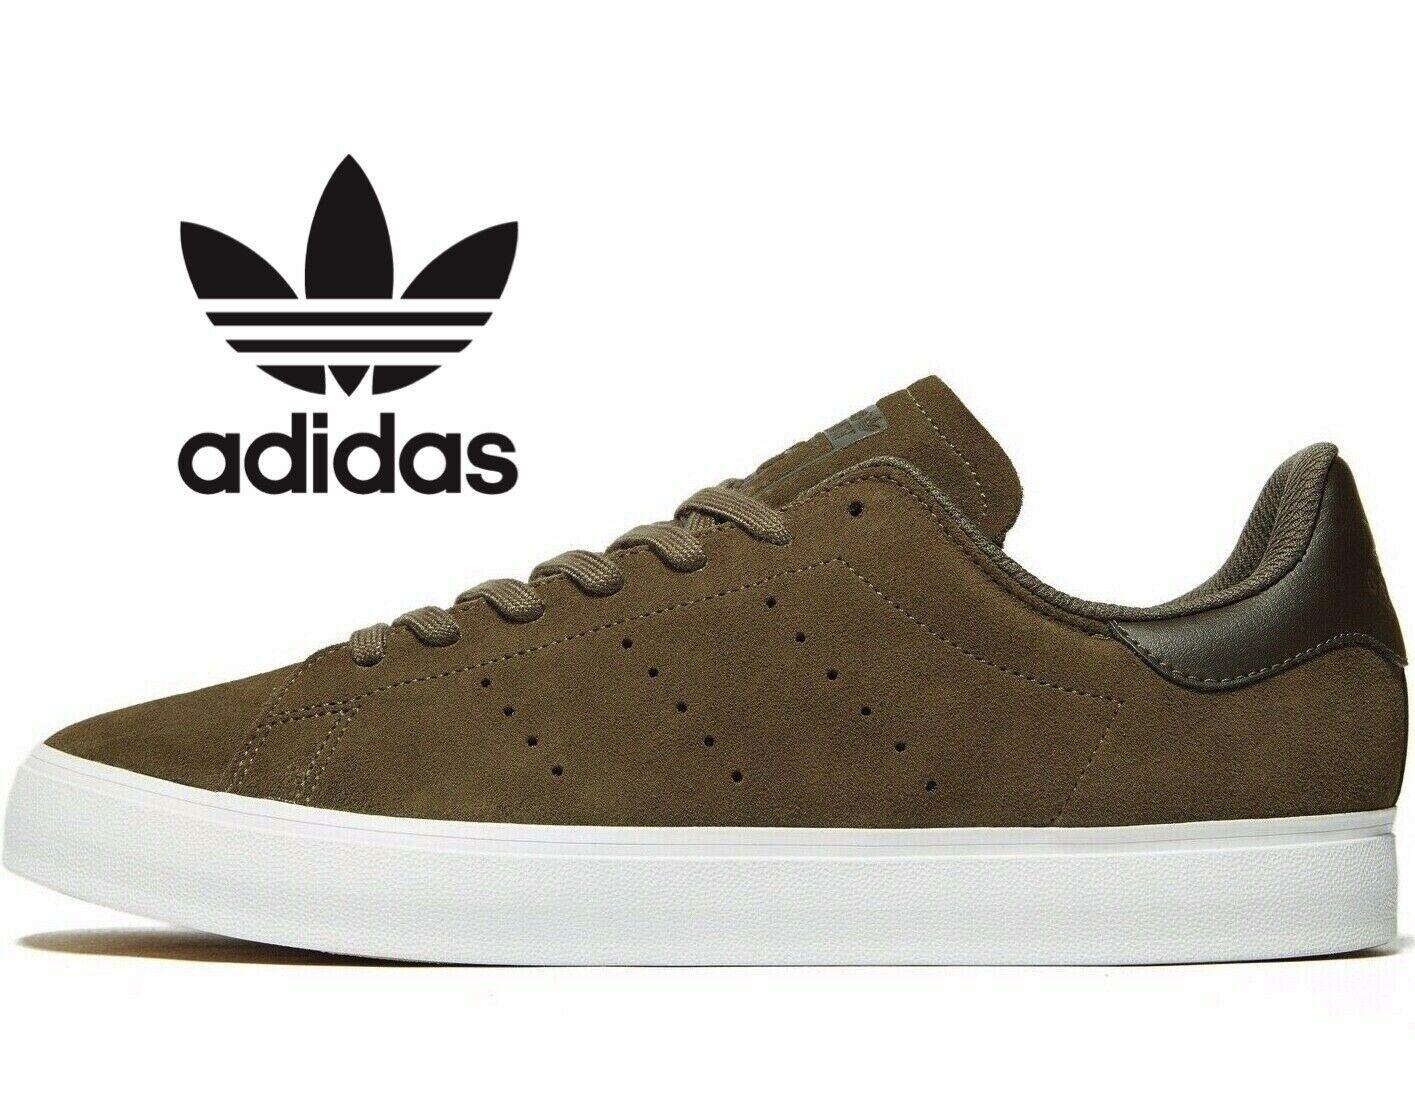 Adidas Originals Stan Vulc ® (Hombres Tallas Smith Reino Unido  6 7 7.5) rama olivo de carga